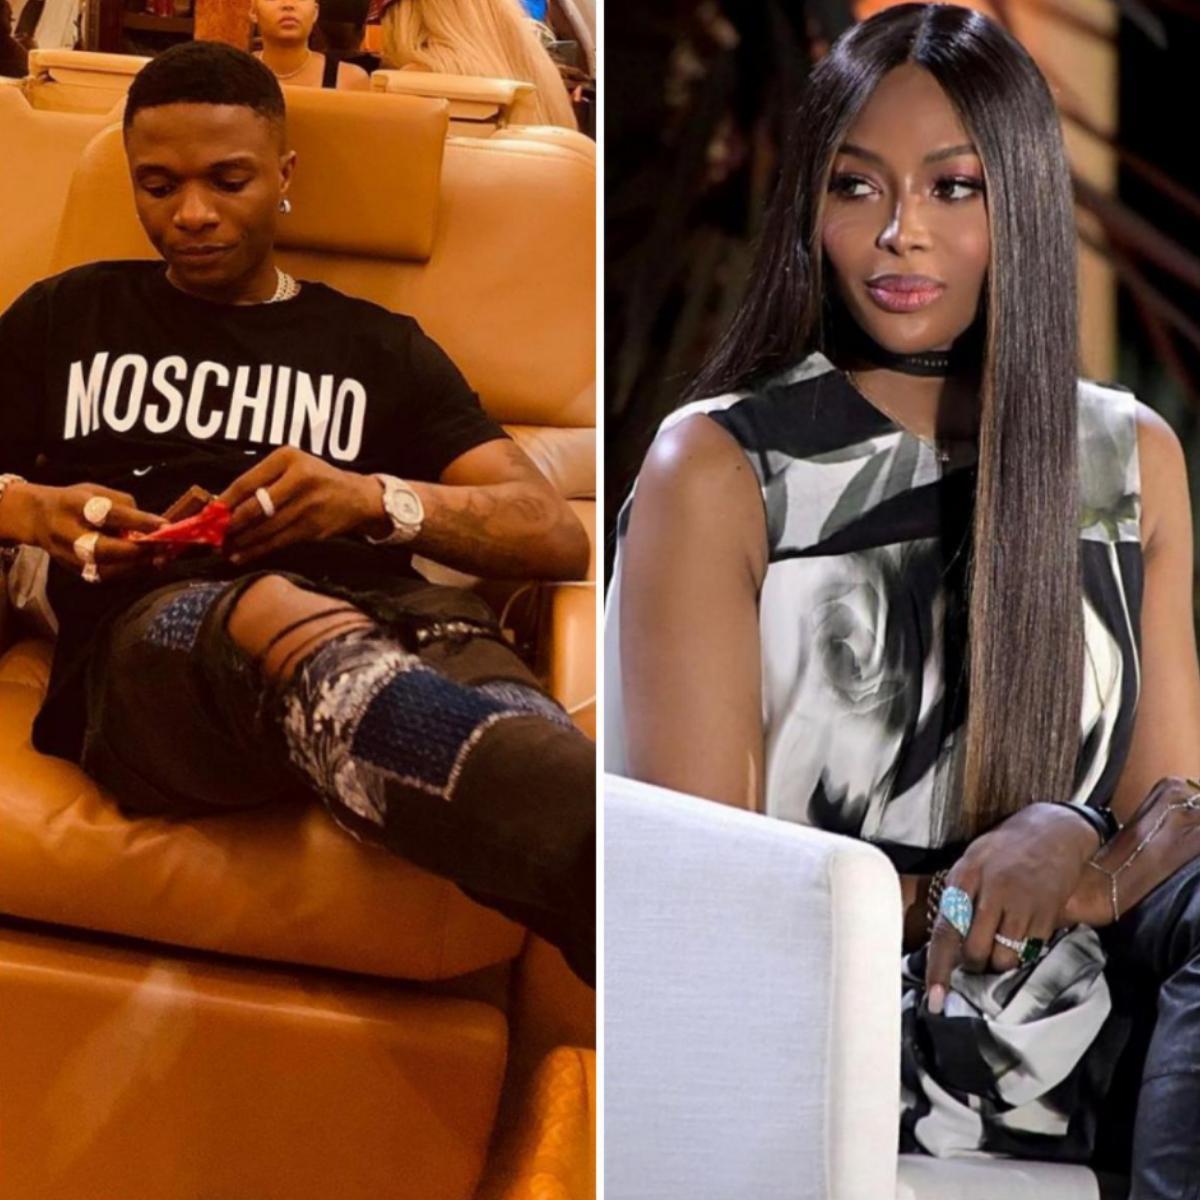 Naomi Campbell Calls Wizkid Lil Brother